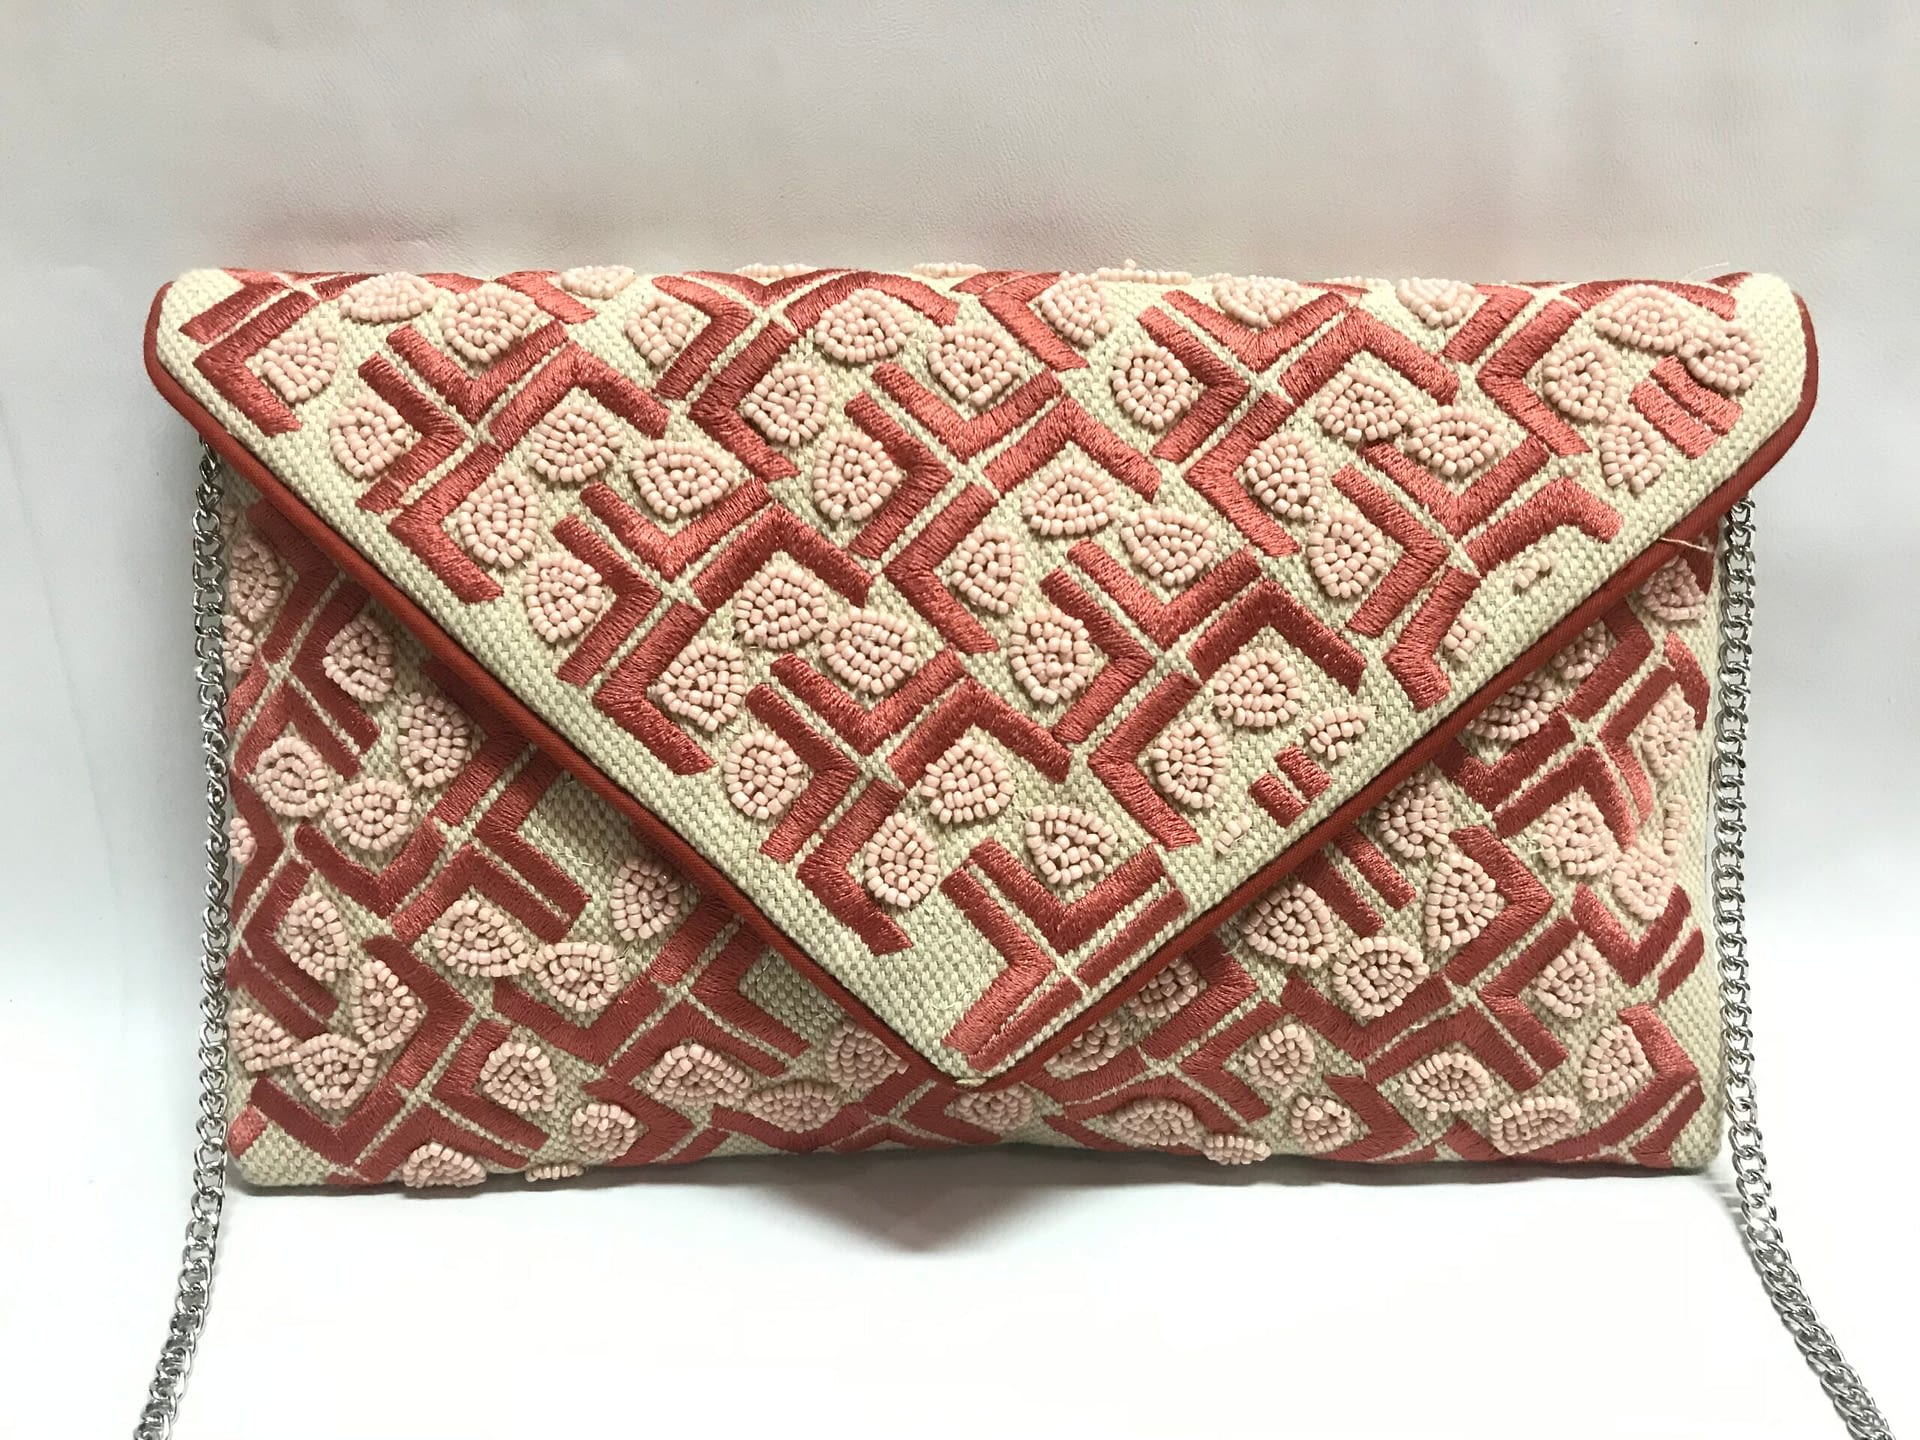 Evening Bag Women Bag Ikat Clutch Bag Ikat Bag Mini Bag Clutch Bag Silk Clutch Bag Ikat Handbag Women Clutch Bag